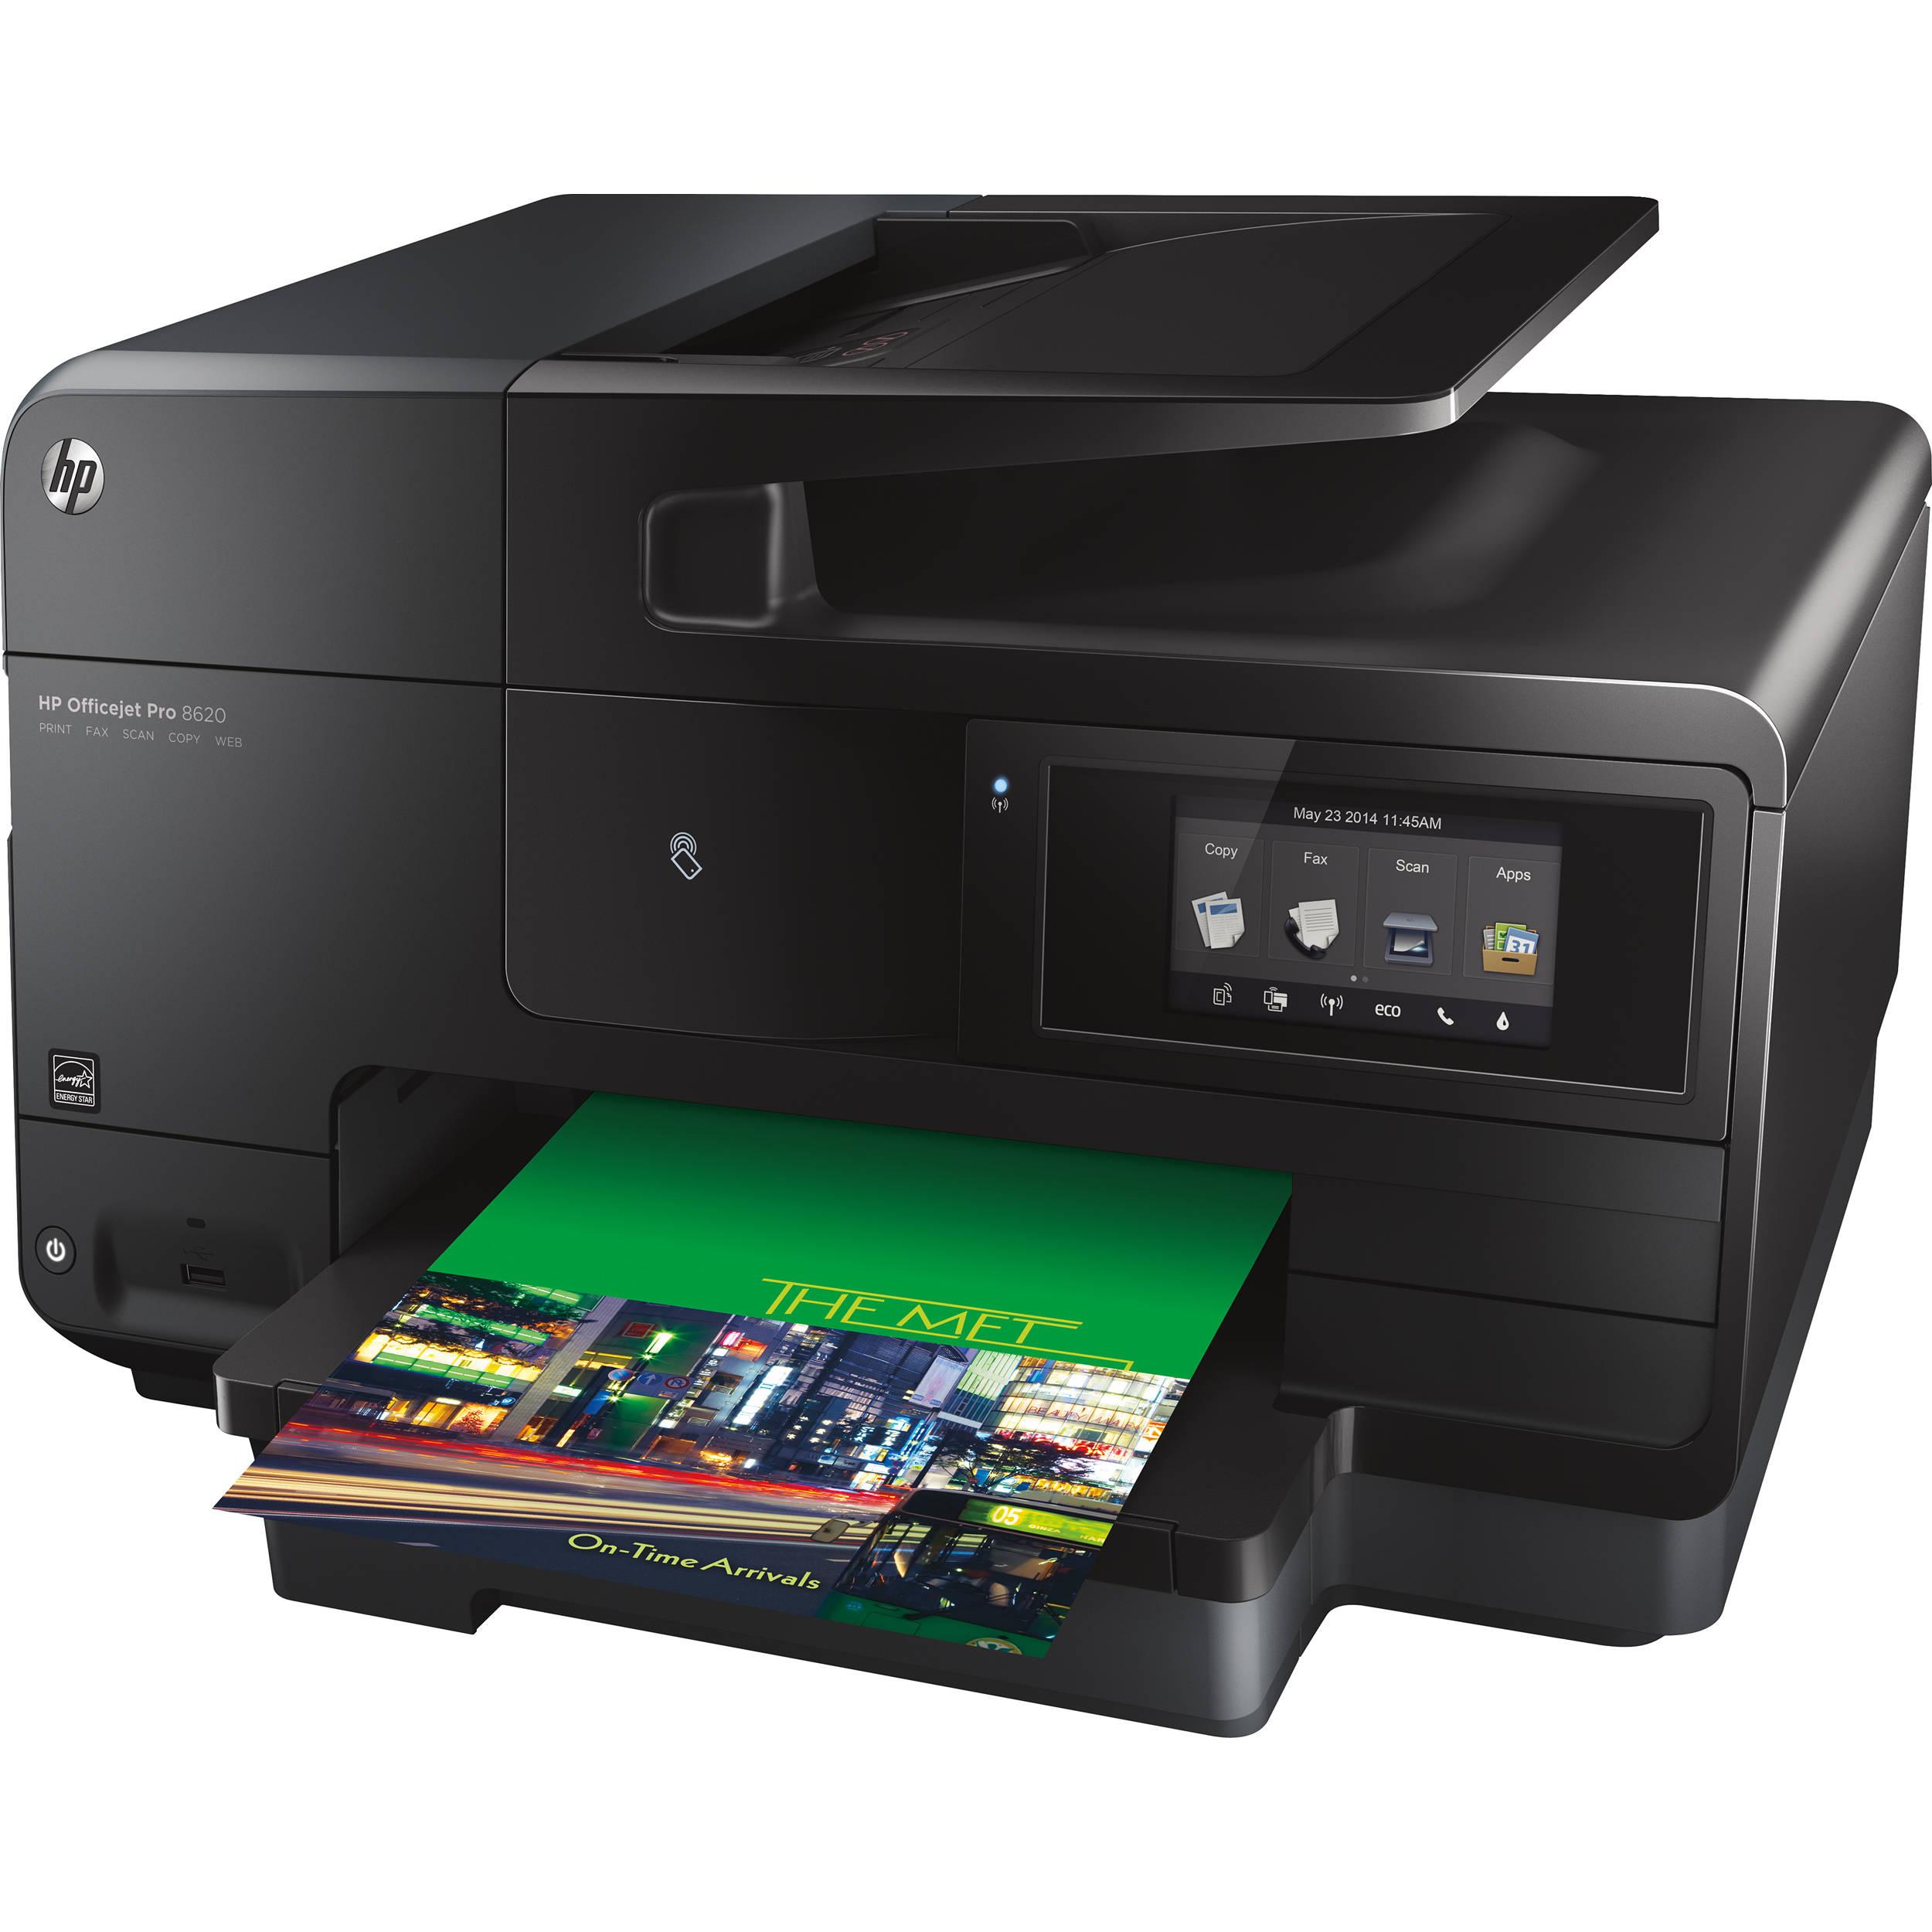 HP Officejet Pro 8620 e-All-in-One Wireless Color Inkjet Printer